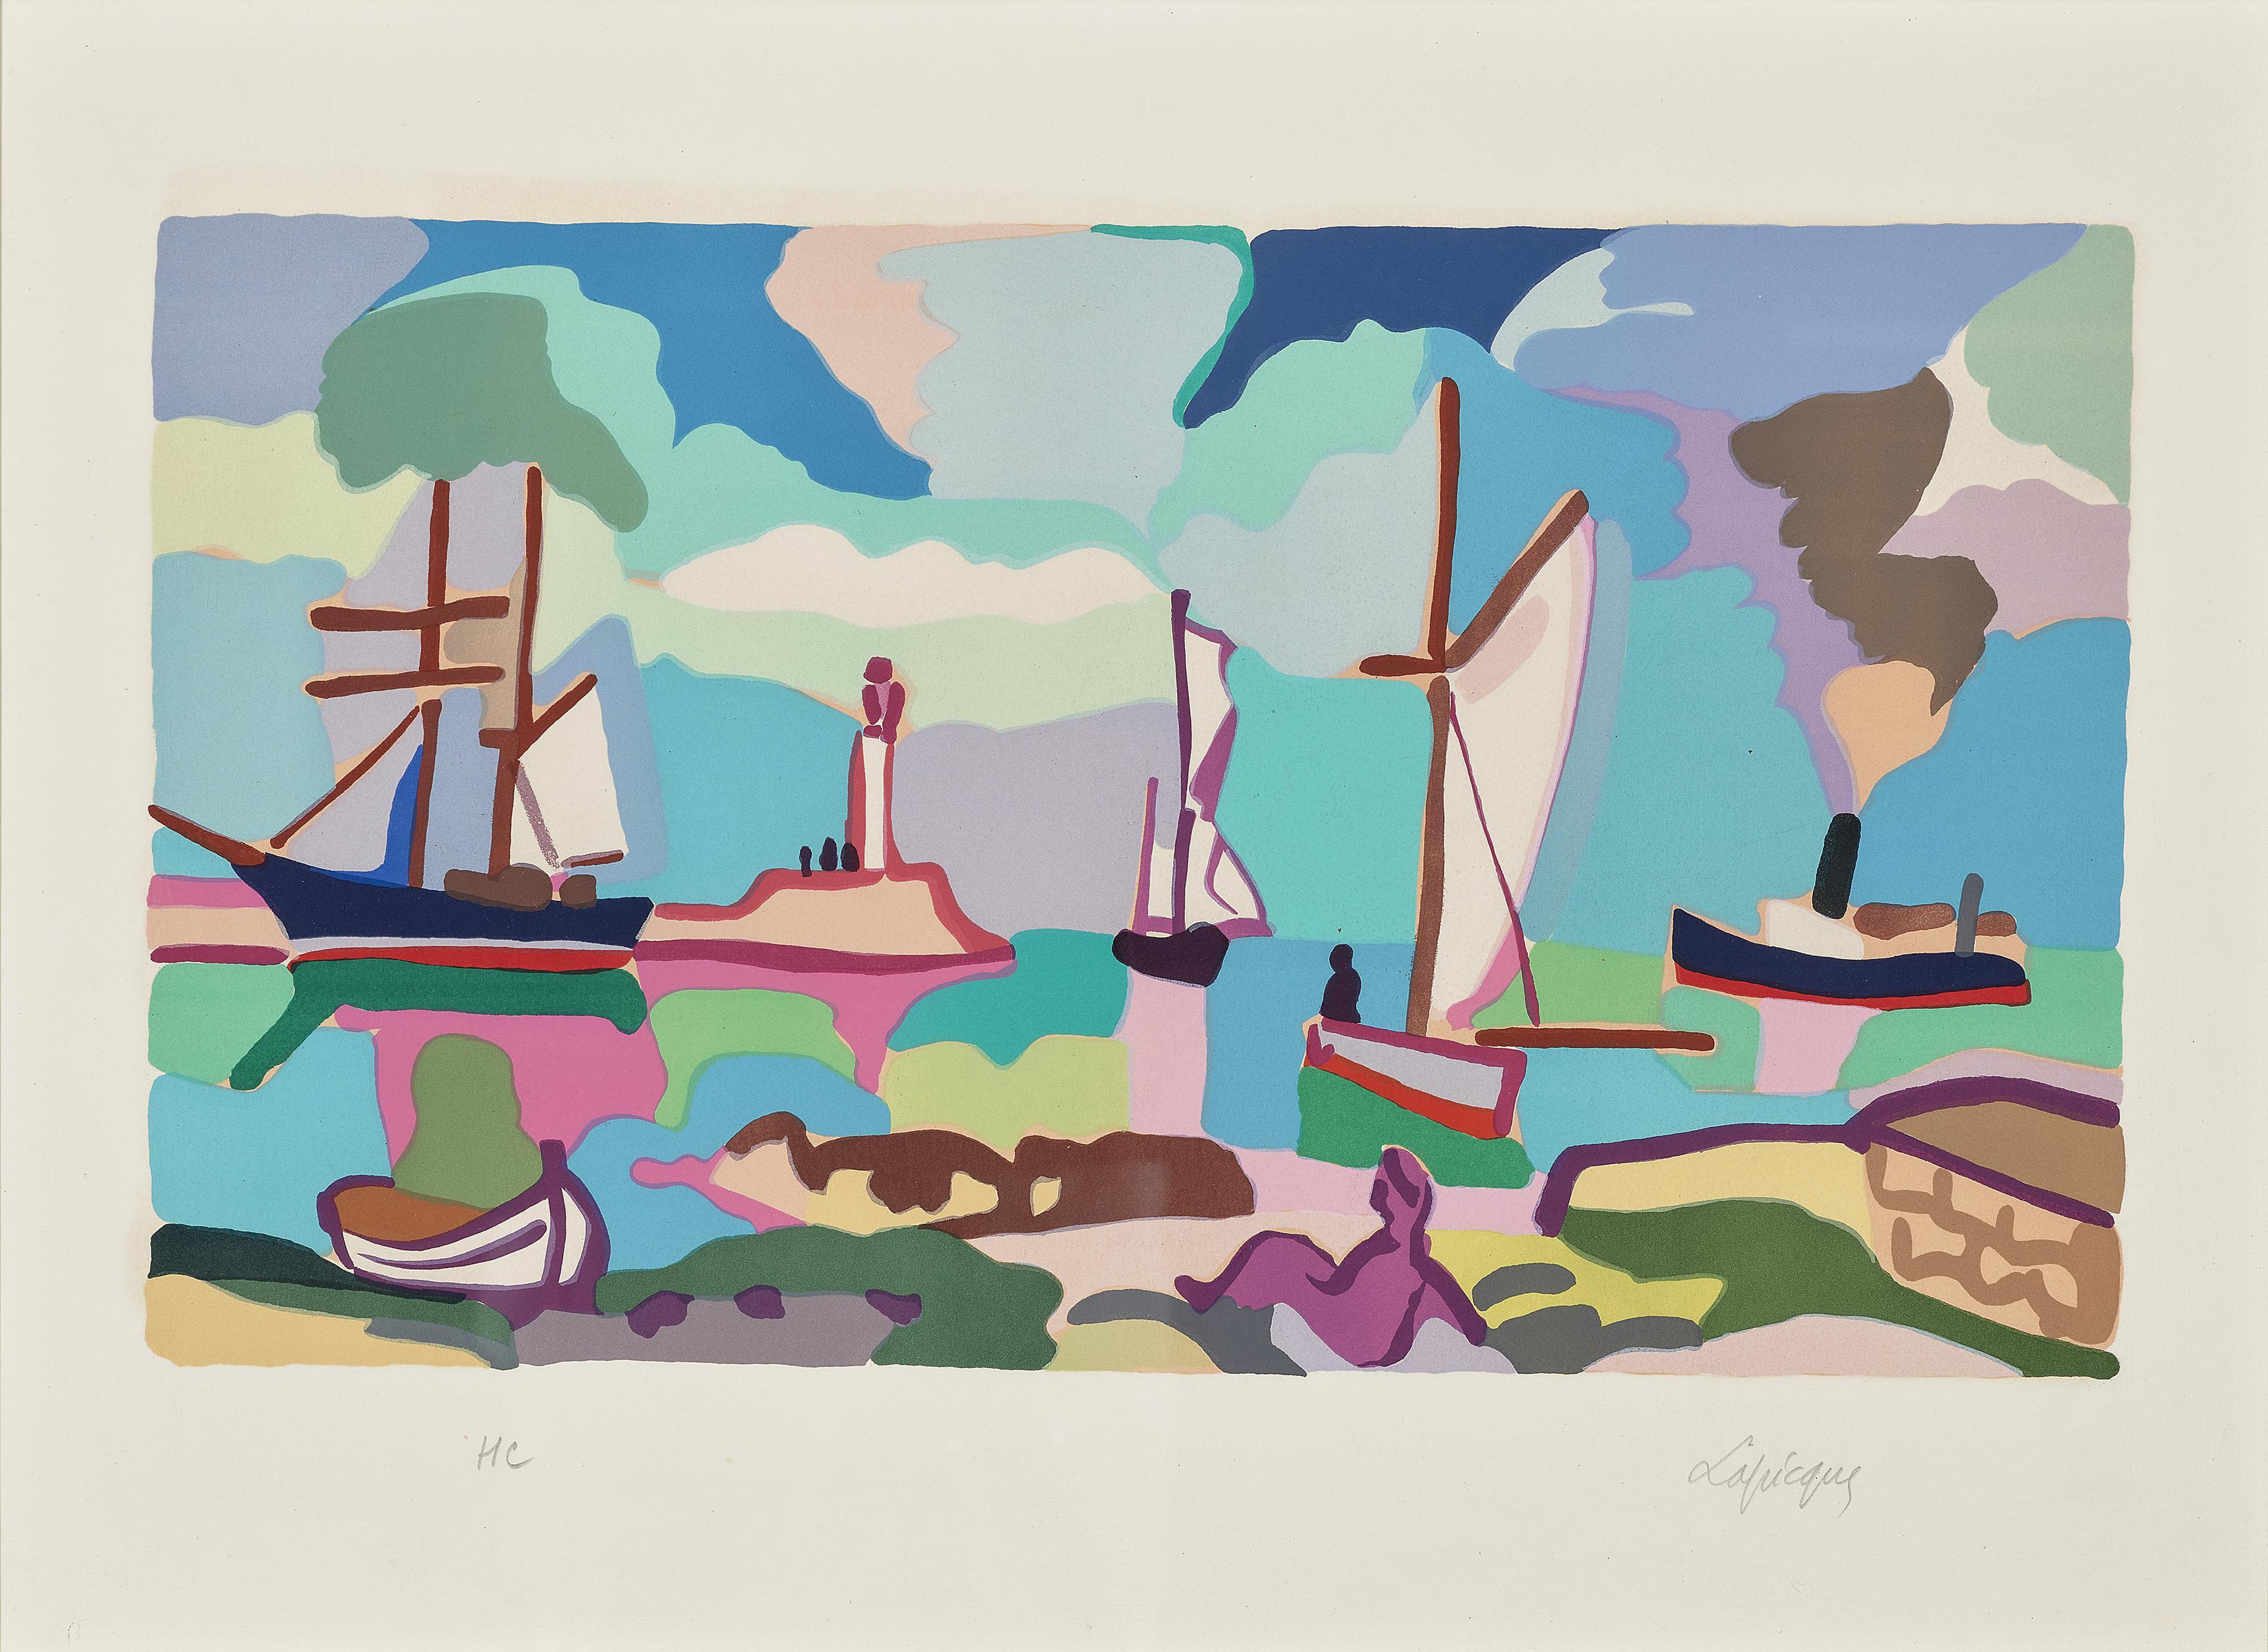 Charles Lapicque-Quetzalcoatl, 1957; Hommage A Boudin, 1970-1970